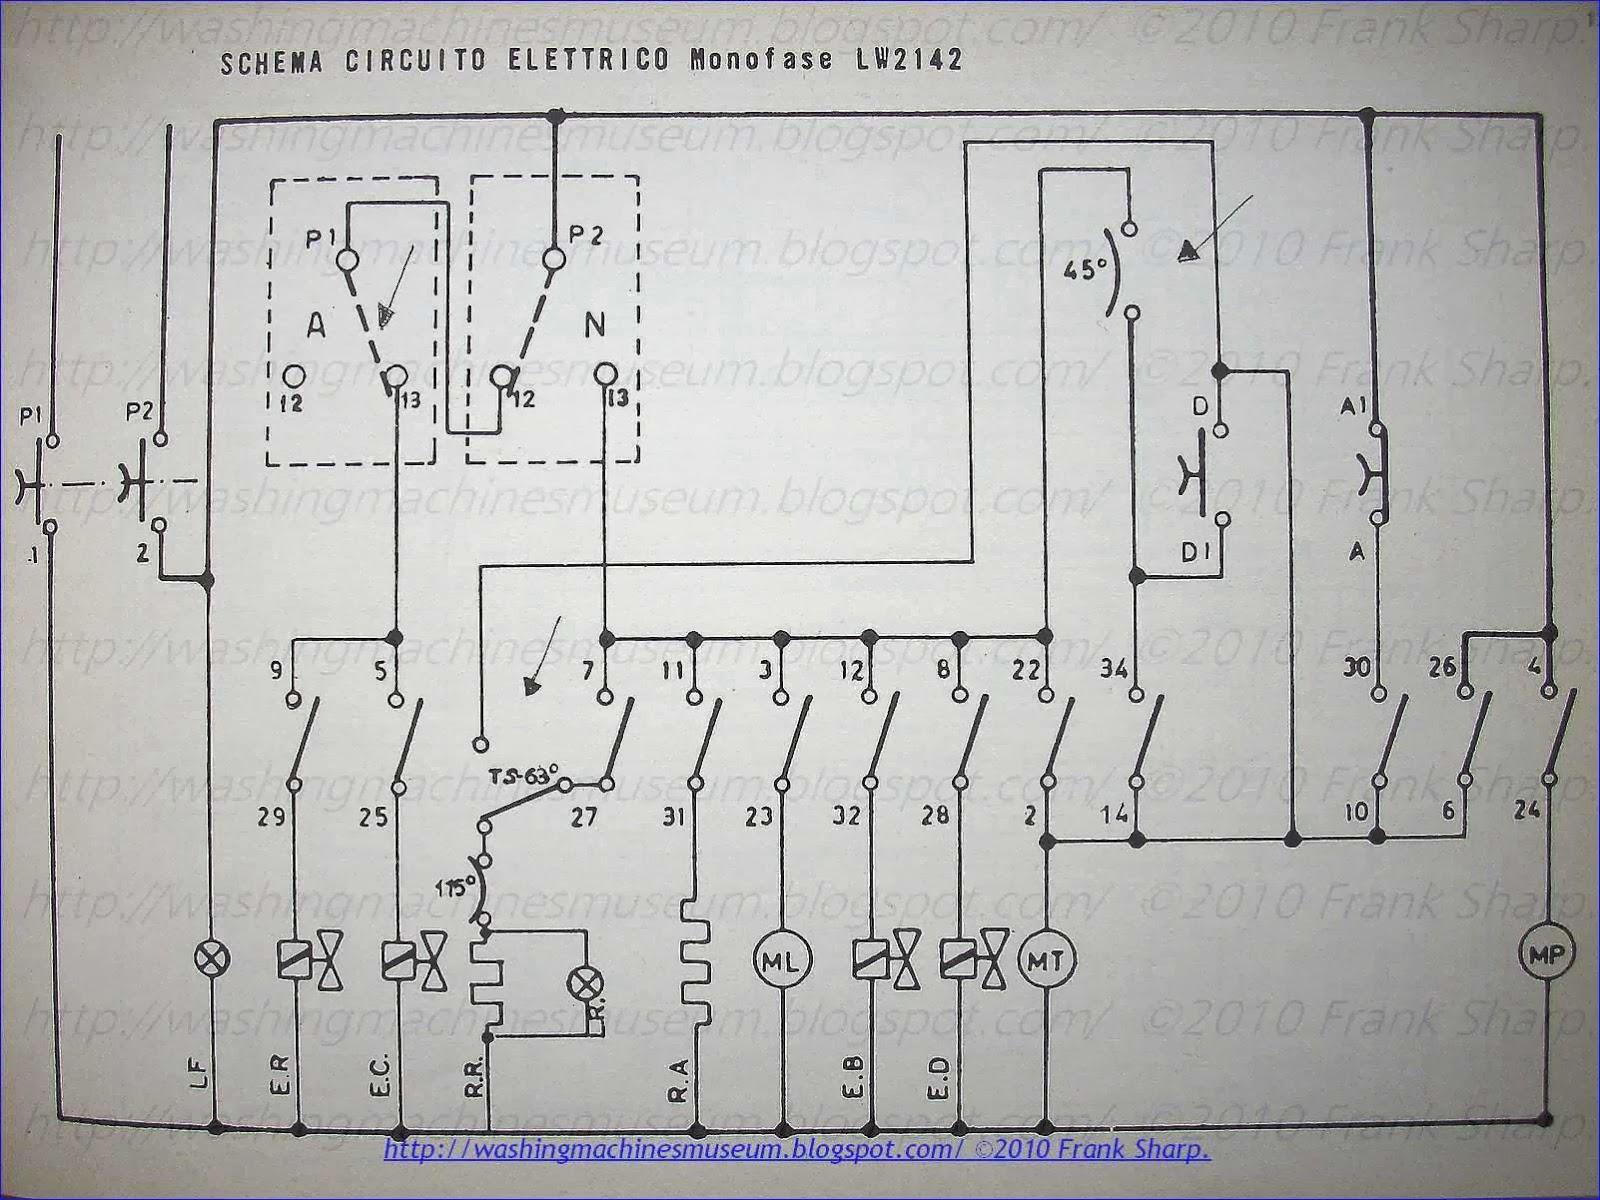 hight resolution of wrg 4272 philco refrigerator wiring diagram philco lw2142 lw2142 a lw2142 b schematic diagram